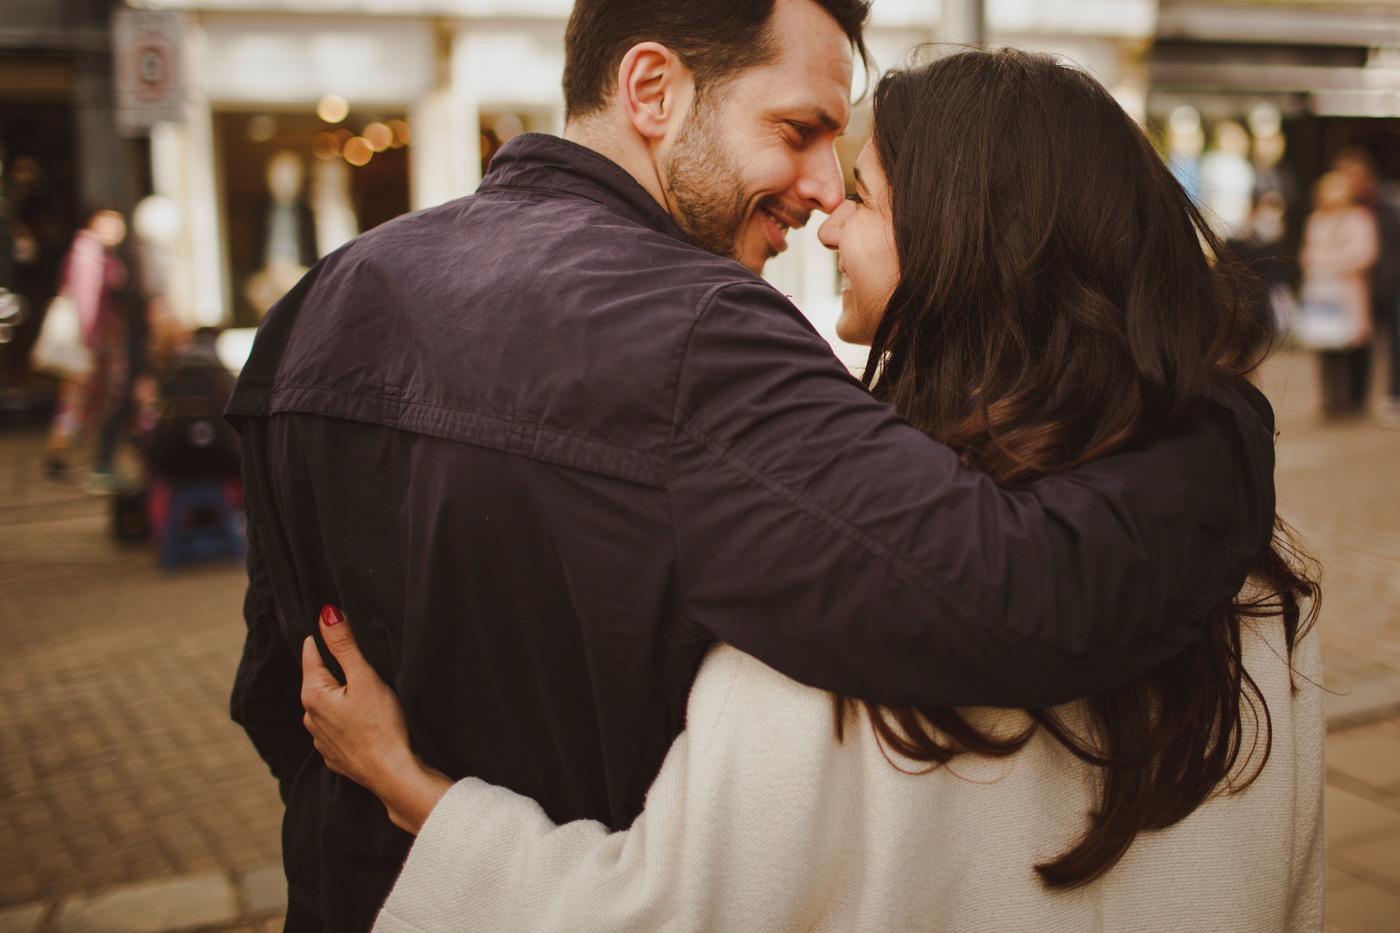 brigton-engagement-photography20.JPG